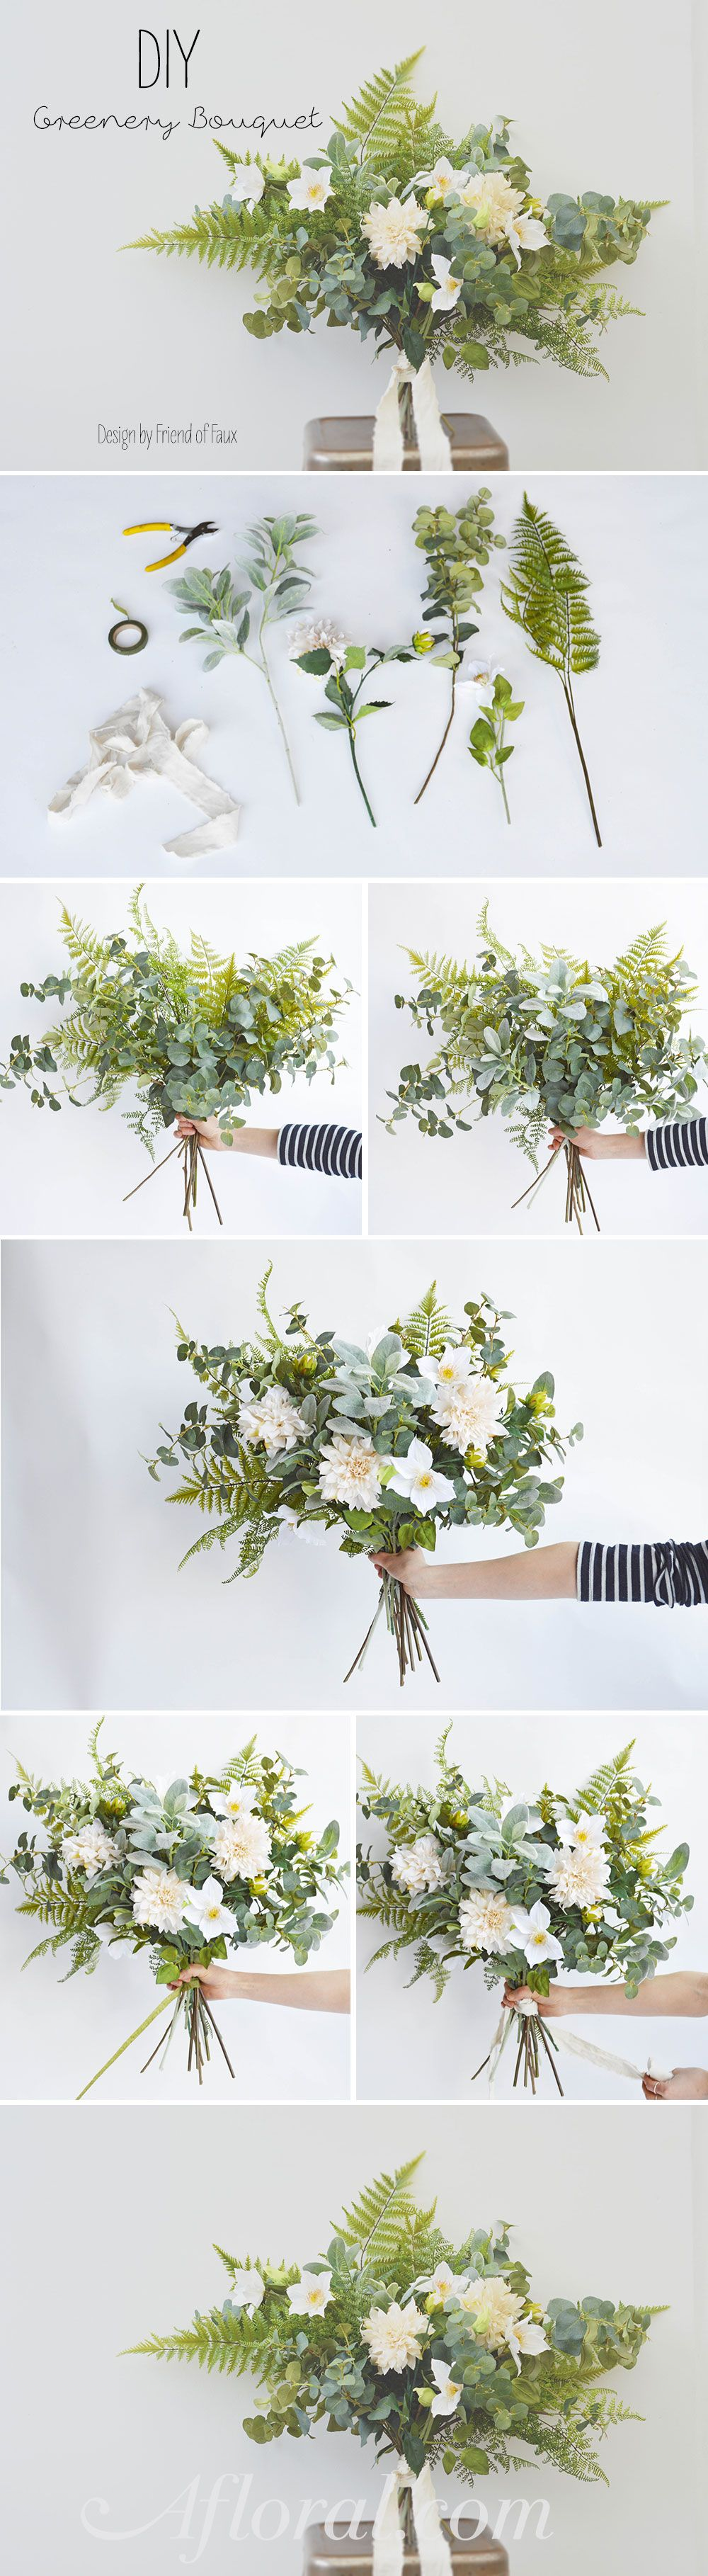 DIY Greenery Bouquet | Simple diy, Greenery and Flower